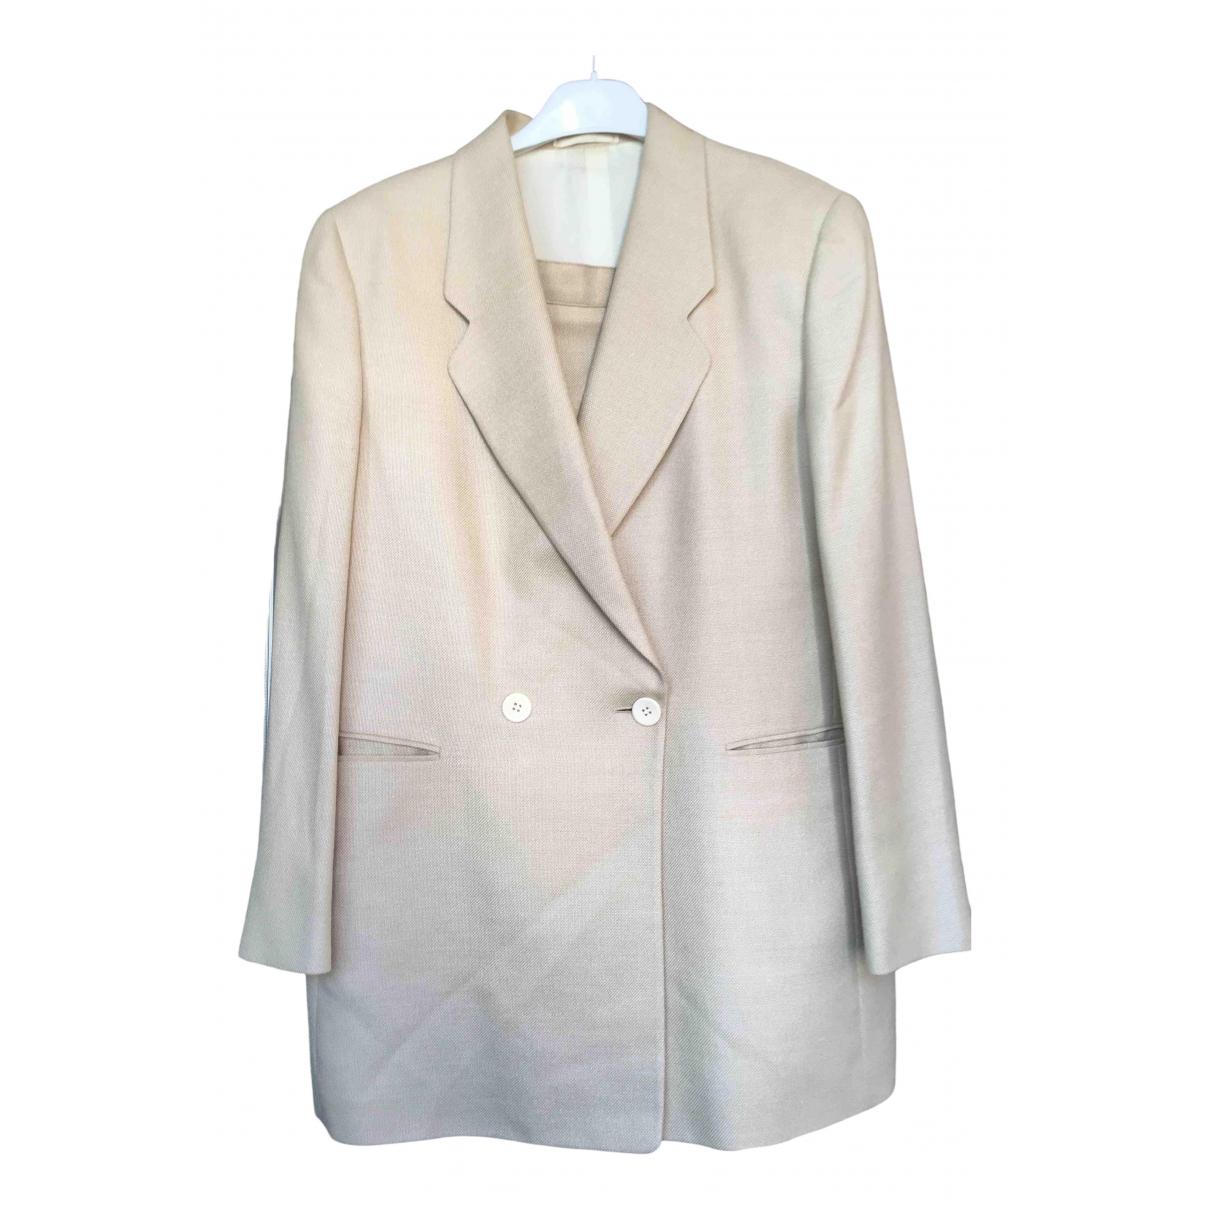 Ballantyne - Veste   pour femme en soie - beige